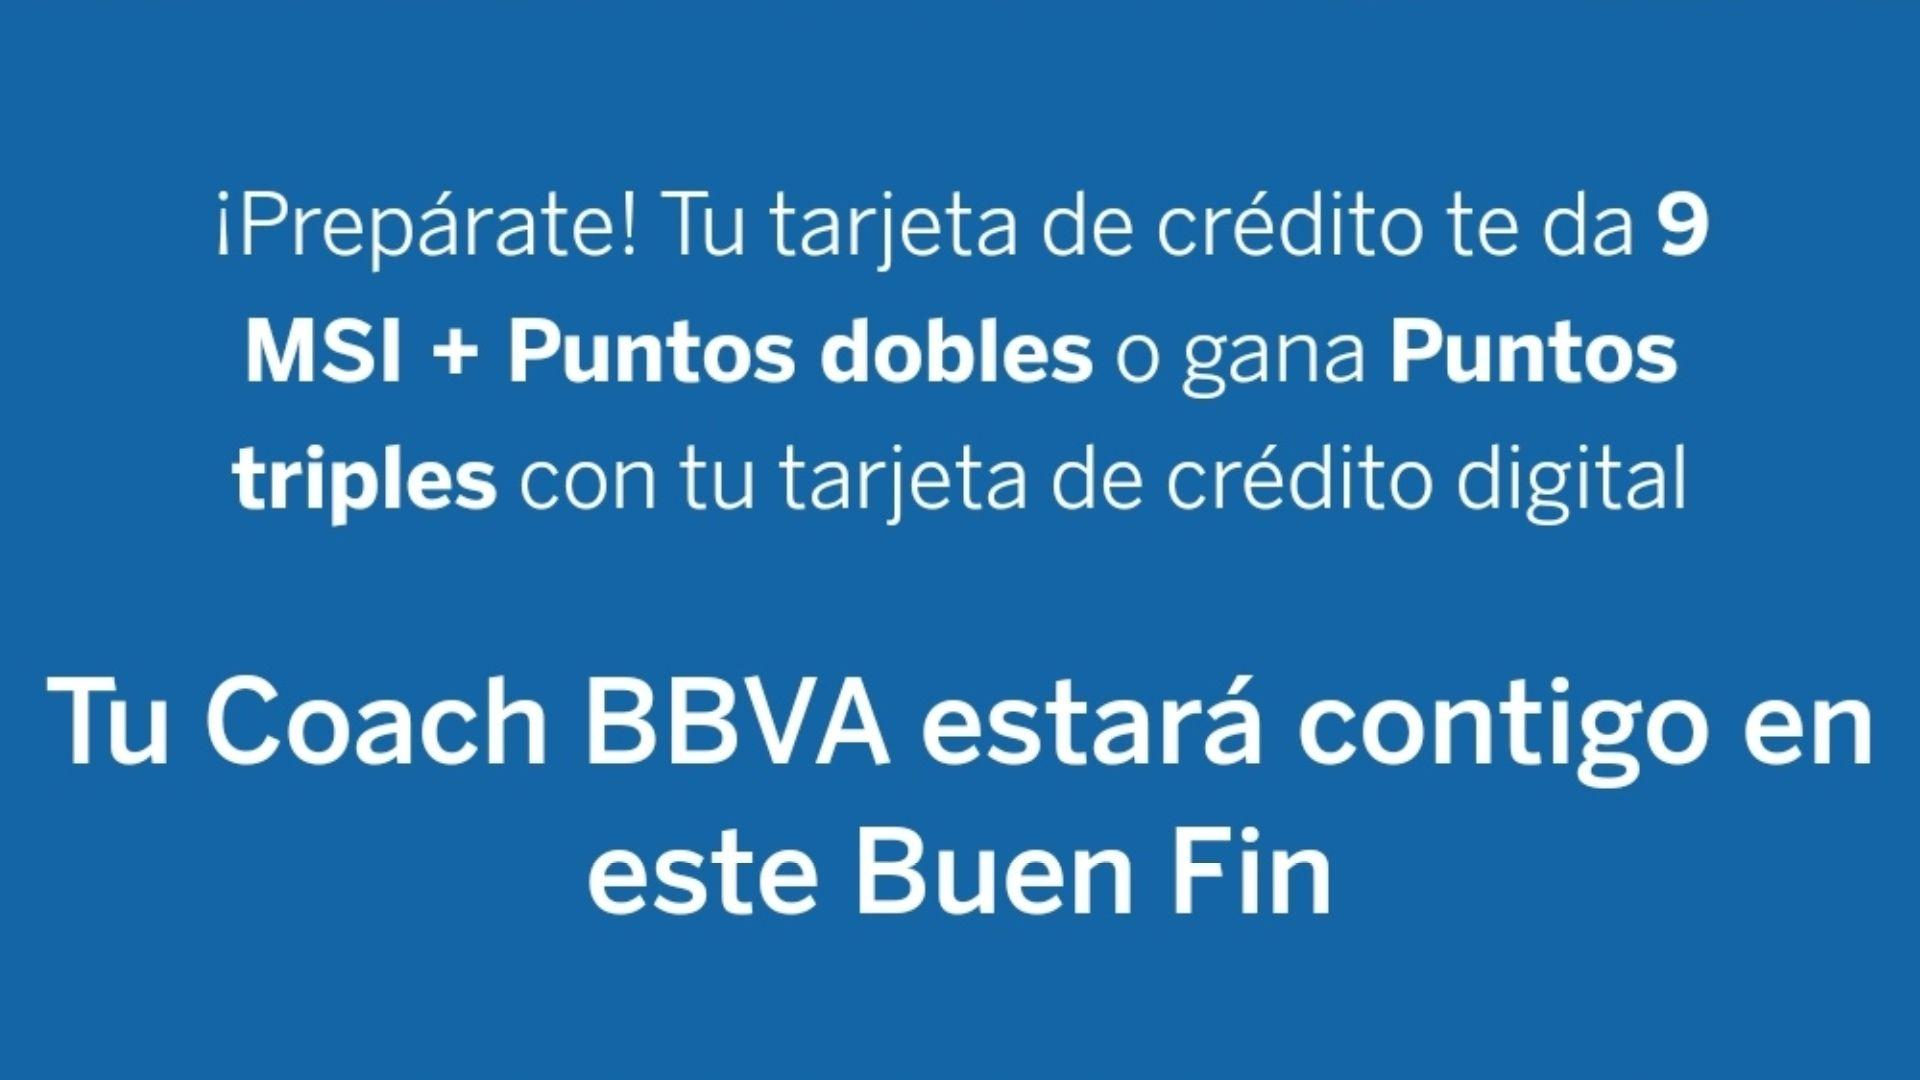 Puntos dobles BBVA Bancomer (del 20 de Noviembre al 20 de Diciembre)